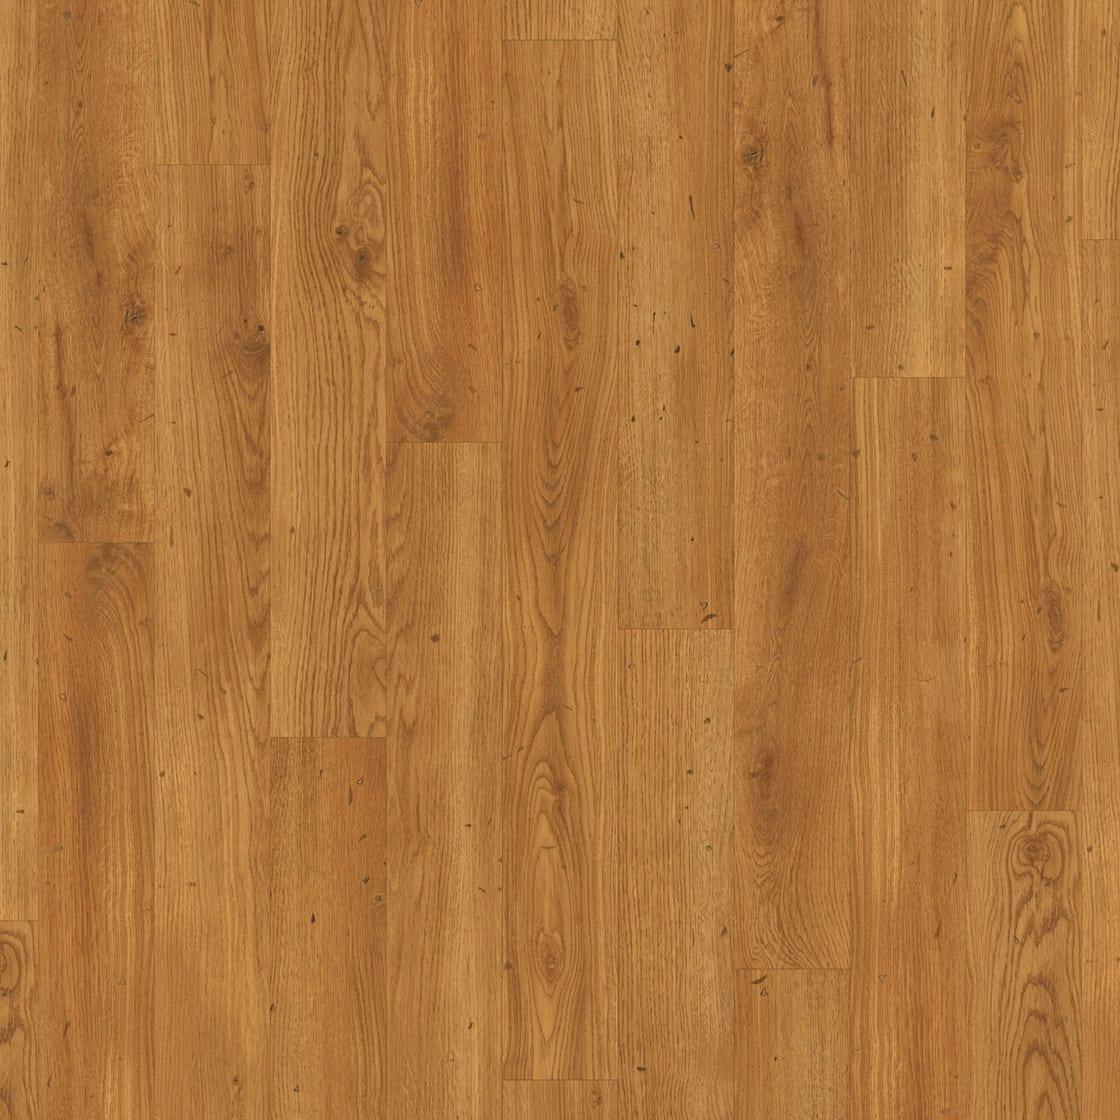 Karndean knight tile wood vinyl plank flooring mckenzie for Plastic hardwood flooring